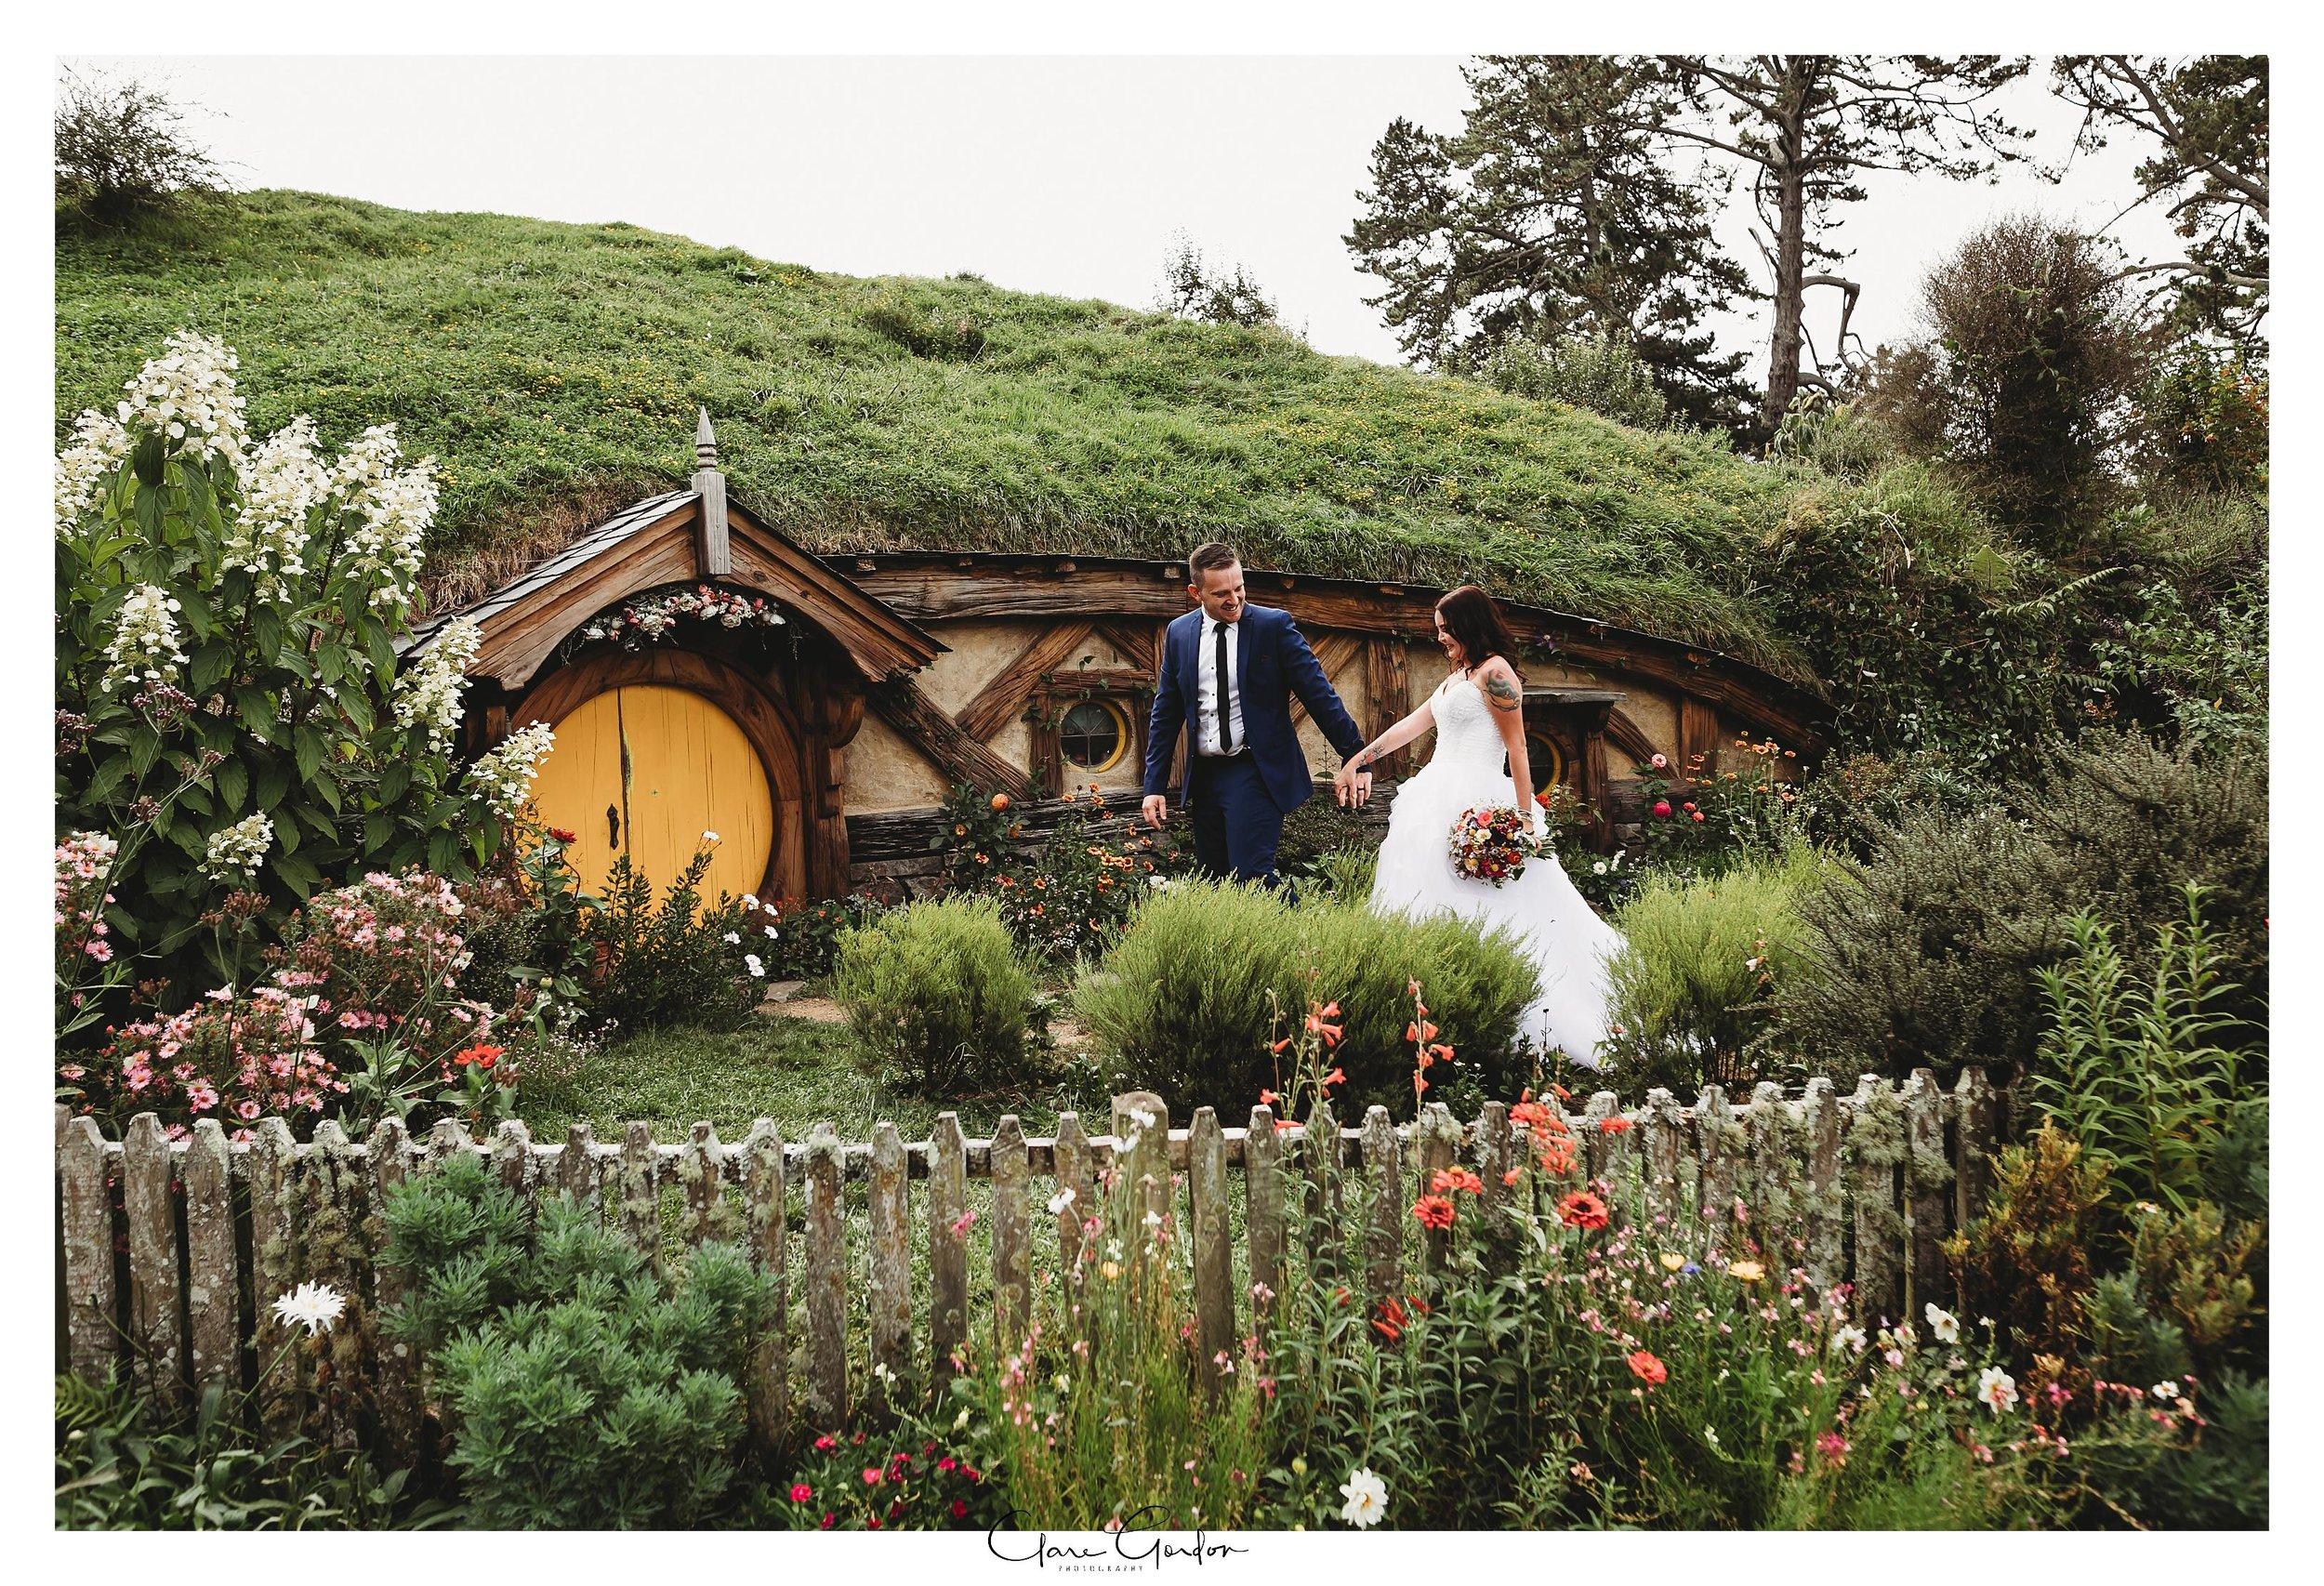 Hobbiton-wedding-bride-and-groom-in-garden